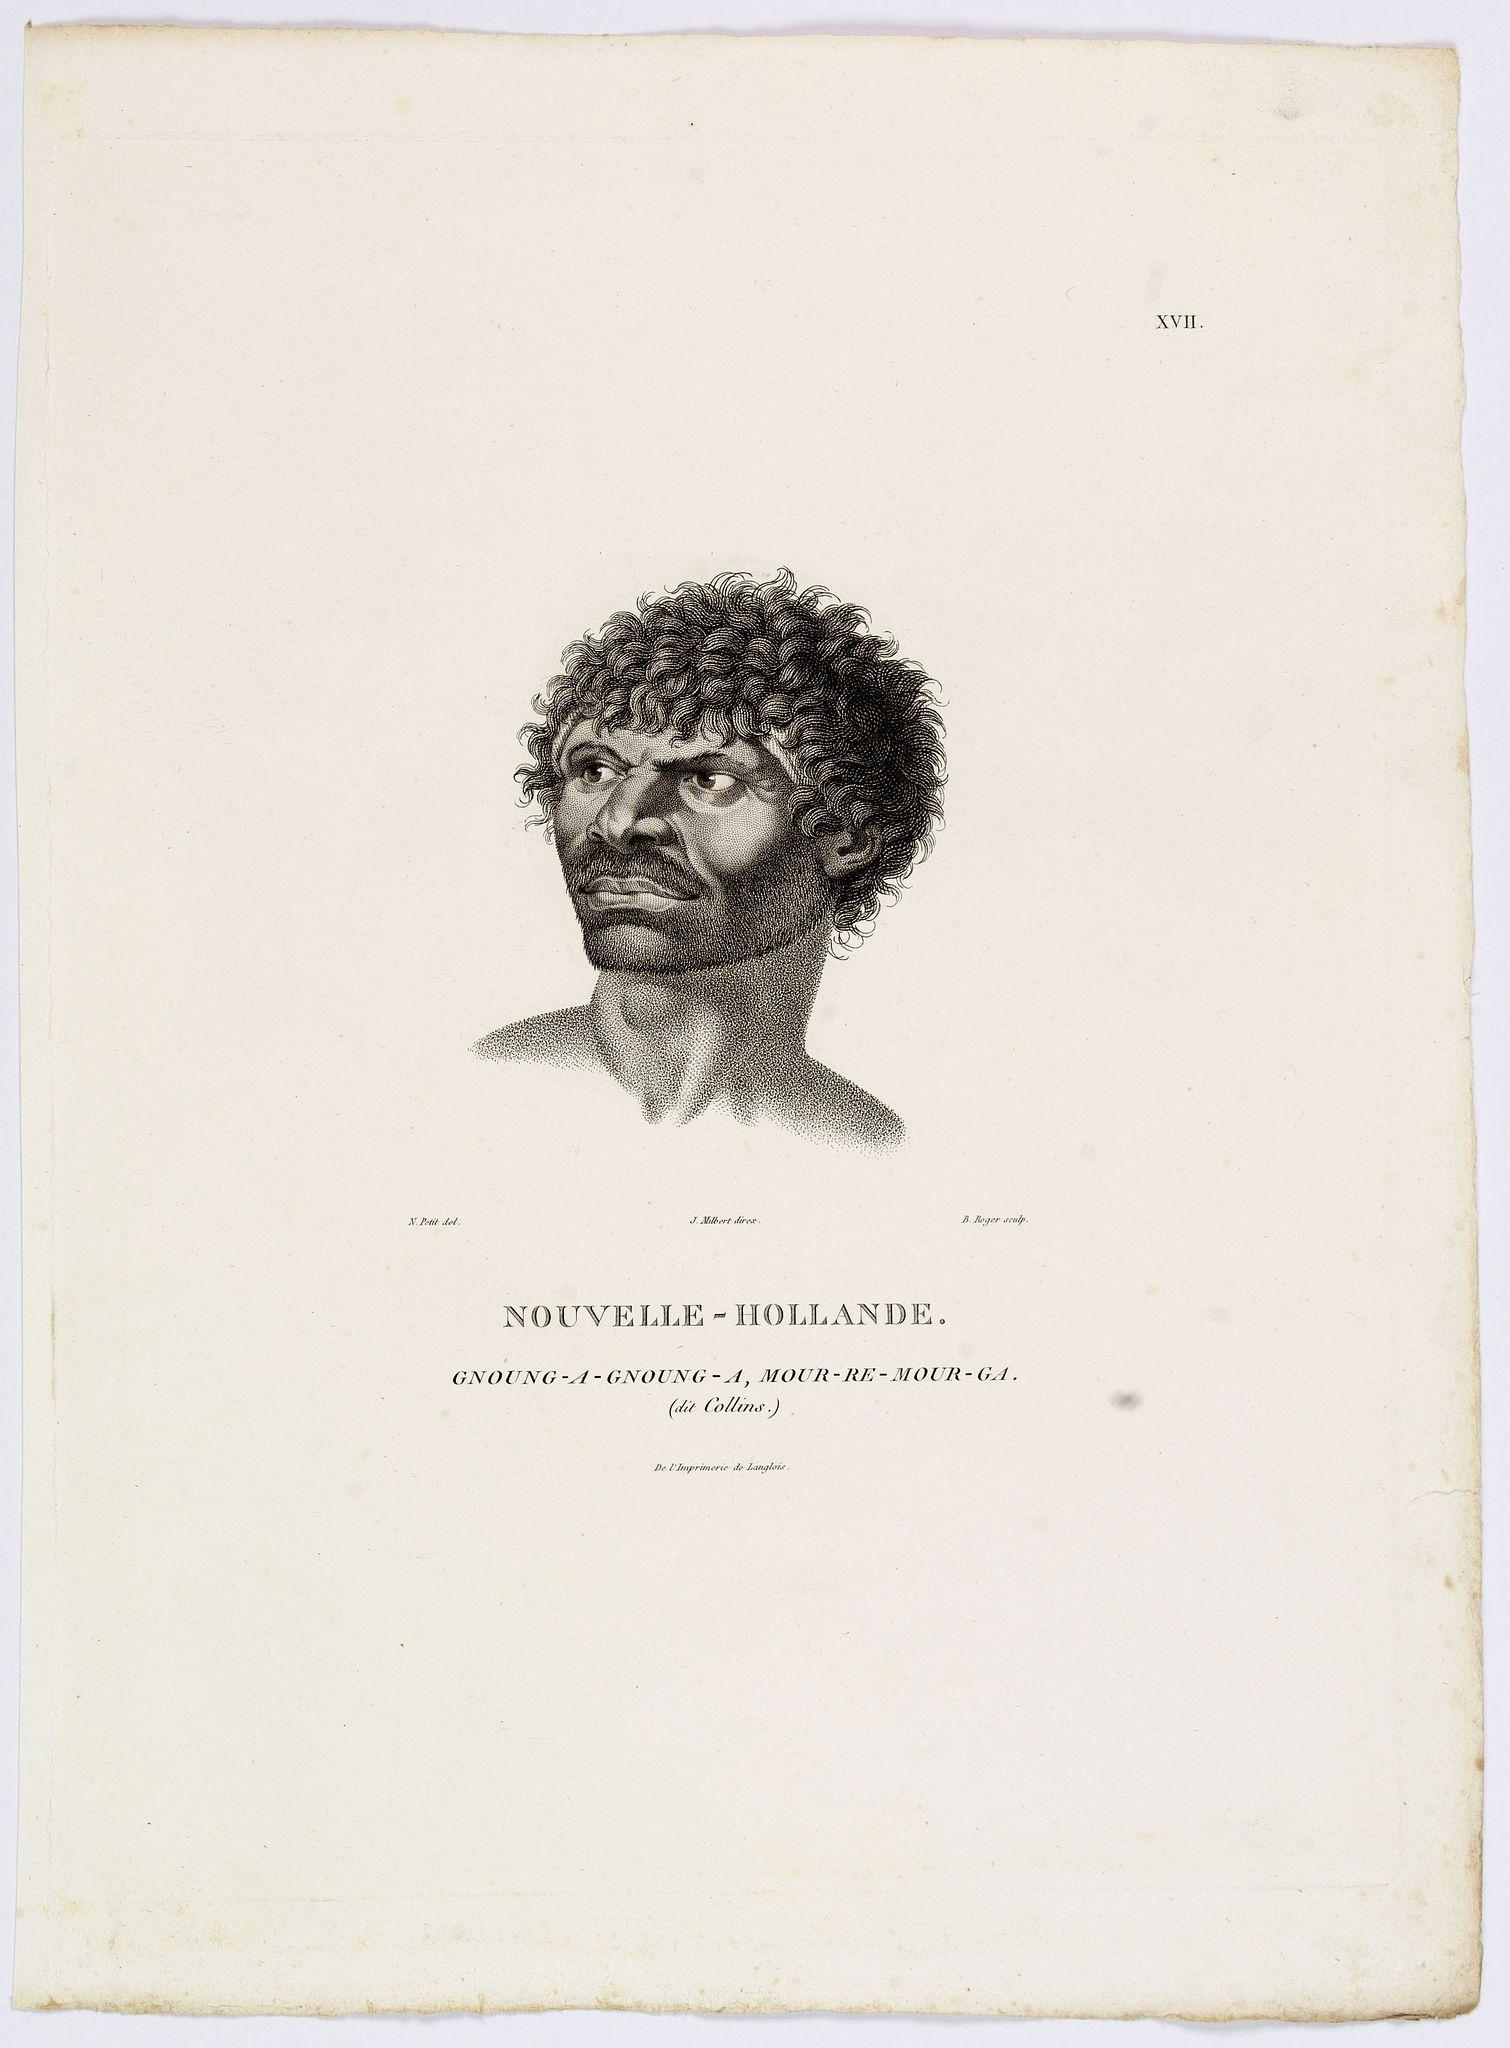 LESUEUR, C-A. / PERON, F. -  Nouvelle-Hollande. Gnoung-A-Gnoung-A, Mour-Re-Mour-Ga.  [plate XVII ]